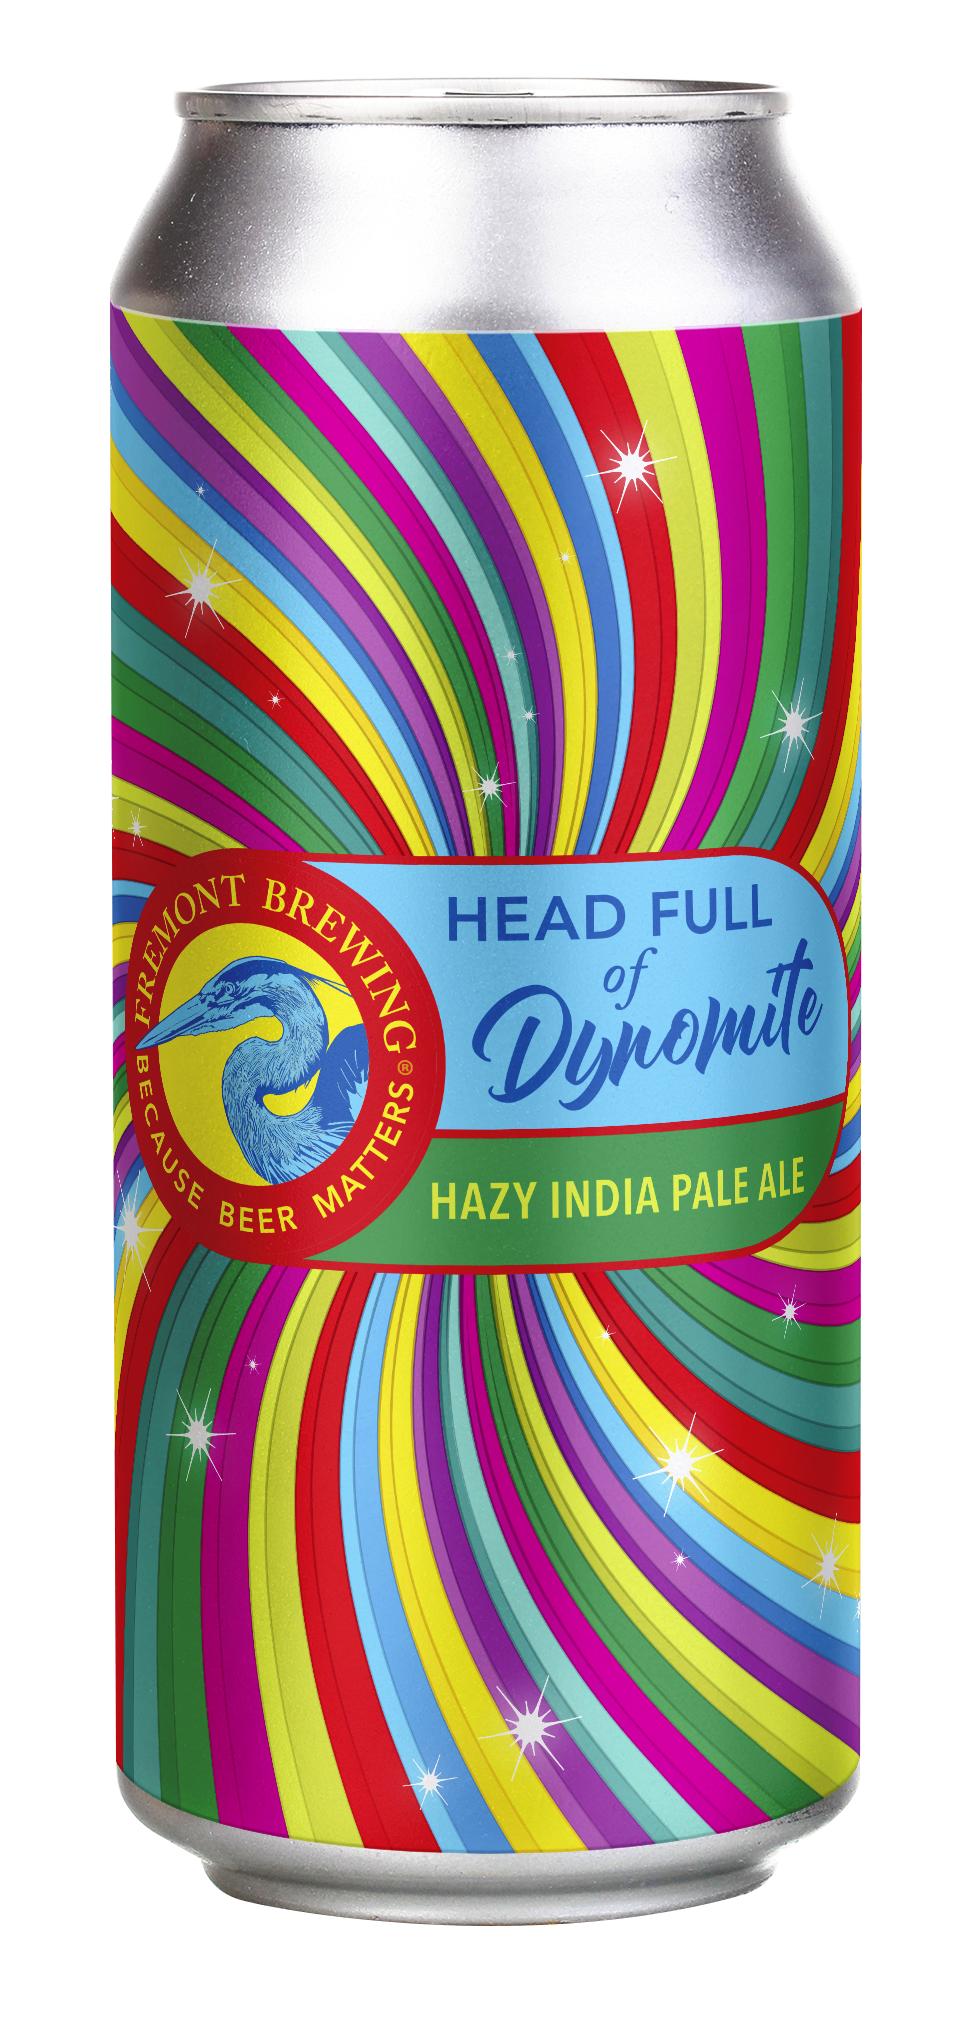 Head Full of Dynomite v.7